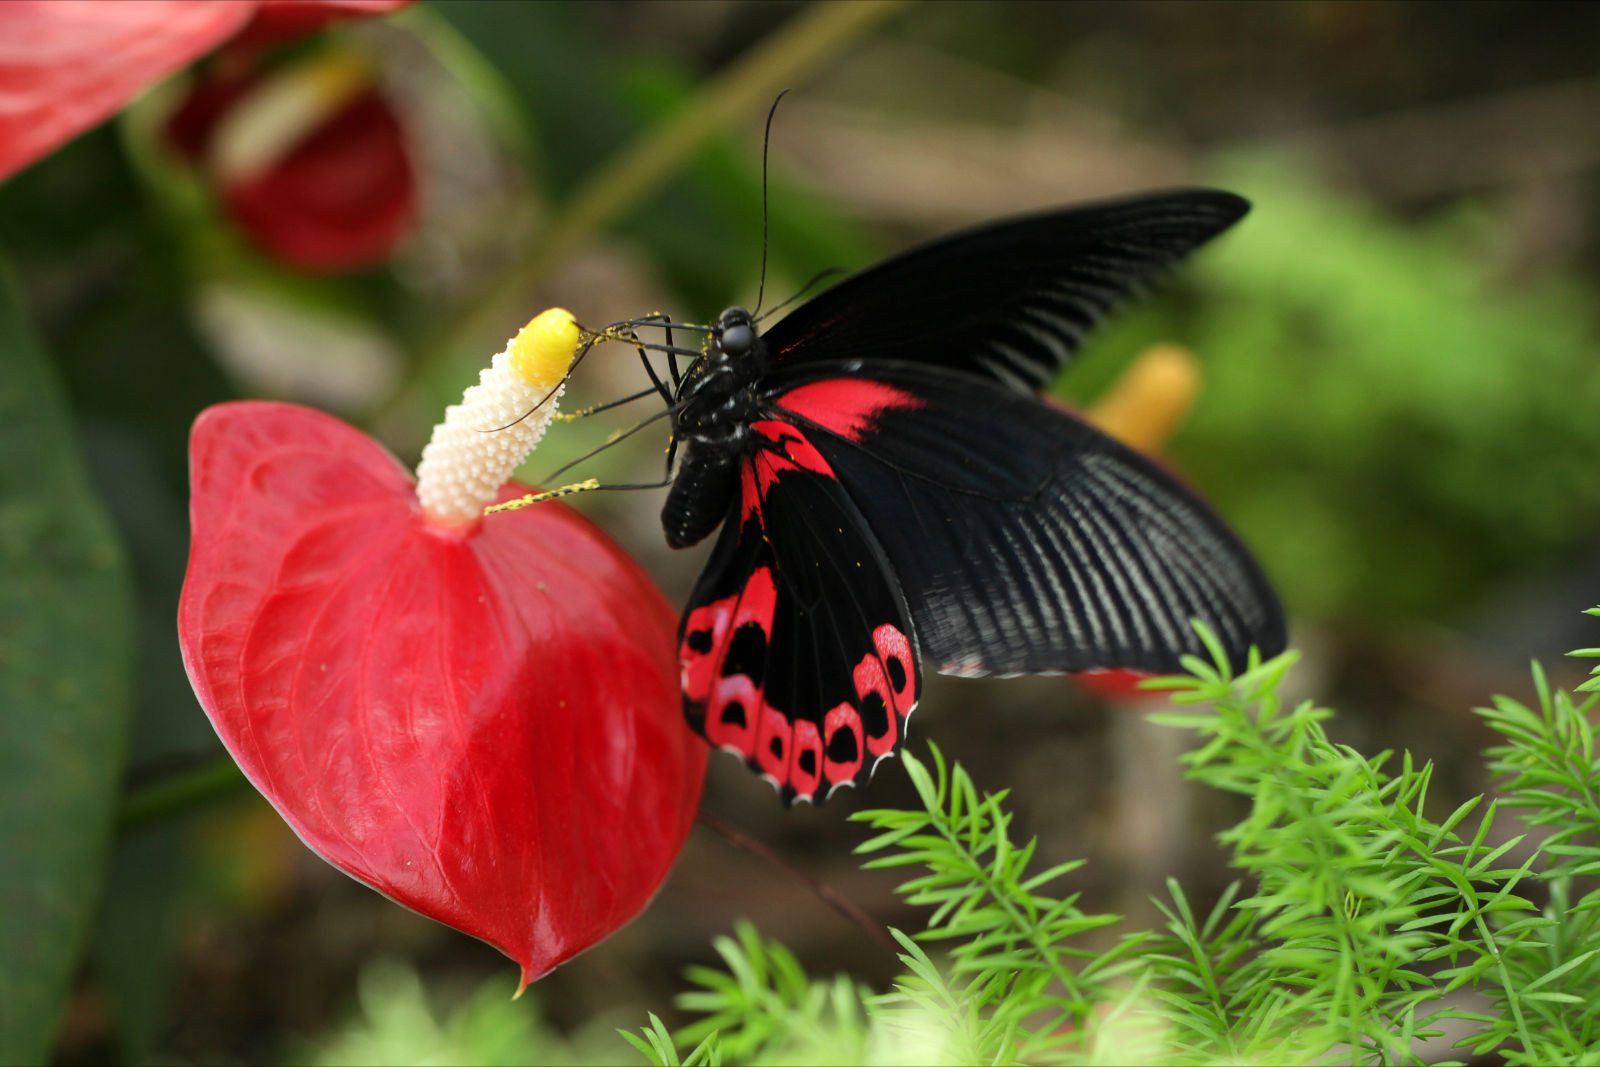 Papilio Rumanzovia in Vlindertuin Vlindorado, Waarland (Schagen, Noord-Holland)